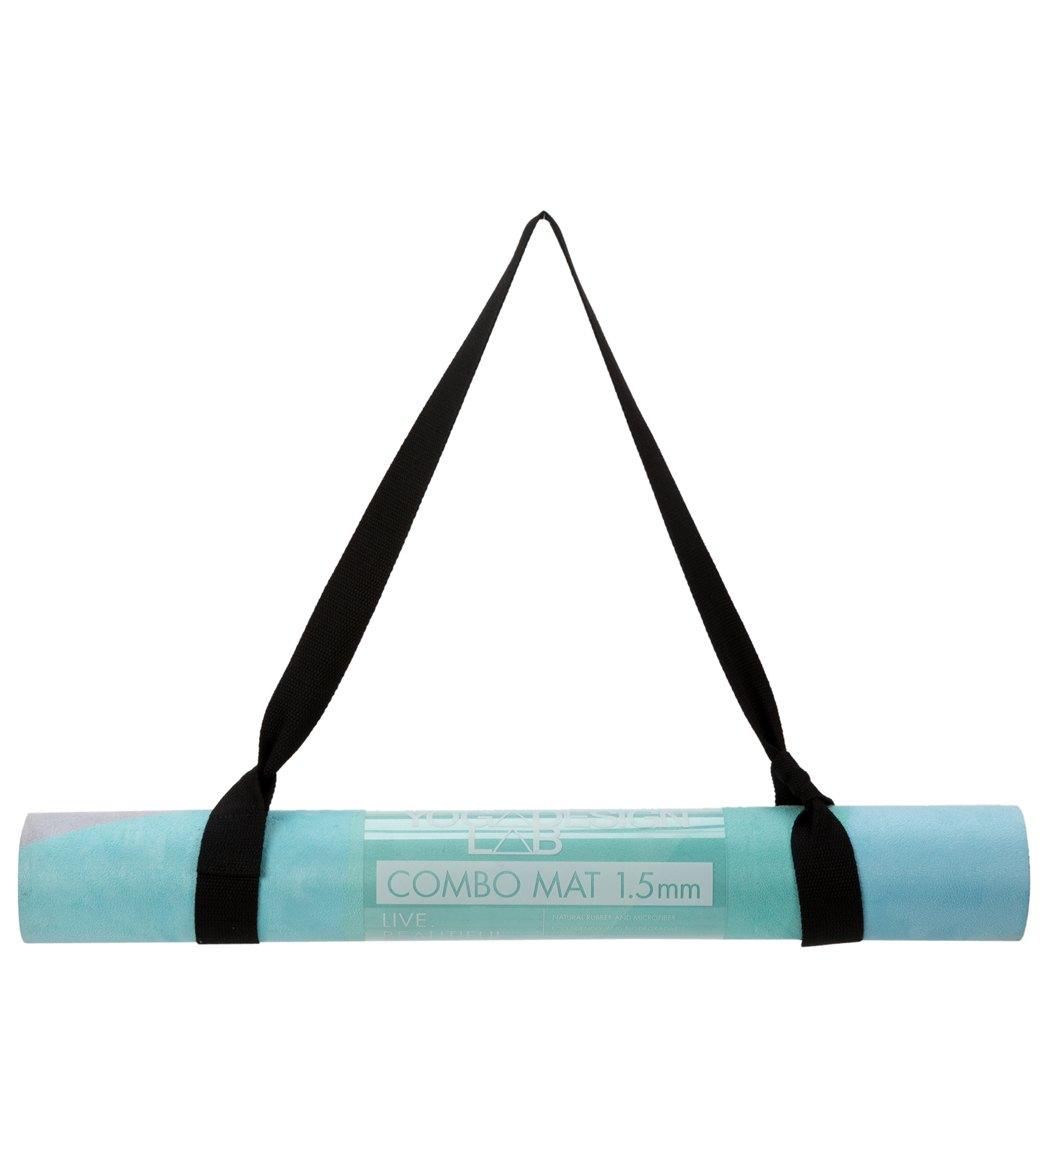 Geo Blue Combo Yoga Mat: Yoga Design Lab Geo Blue Combo Yoga Mat LITE At YogaOutlet